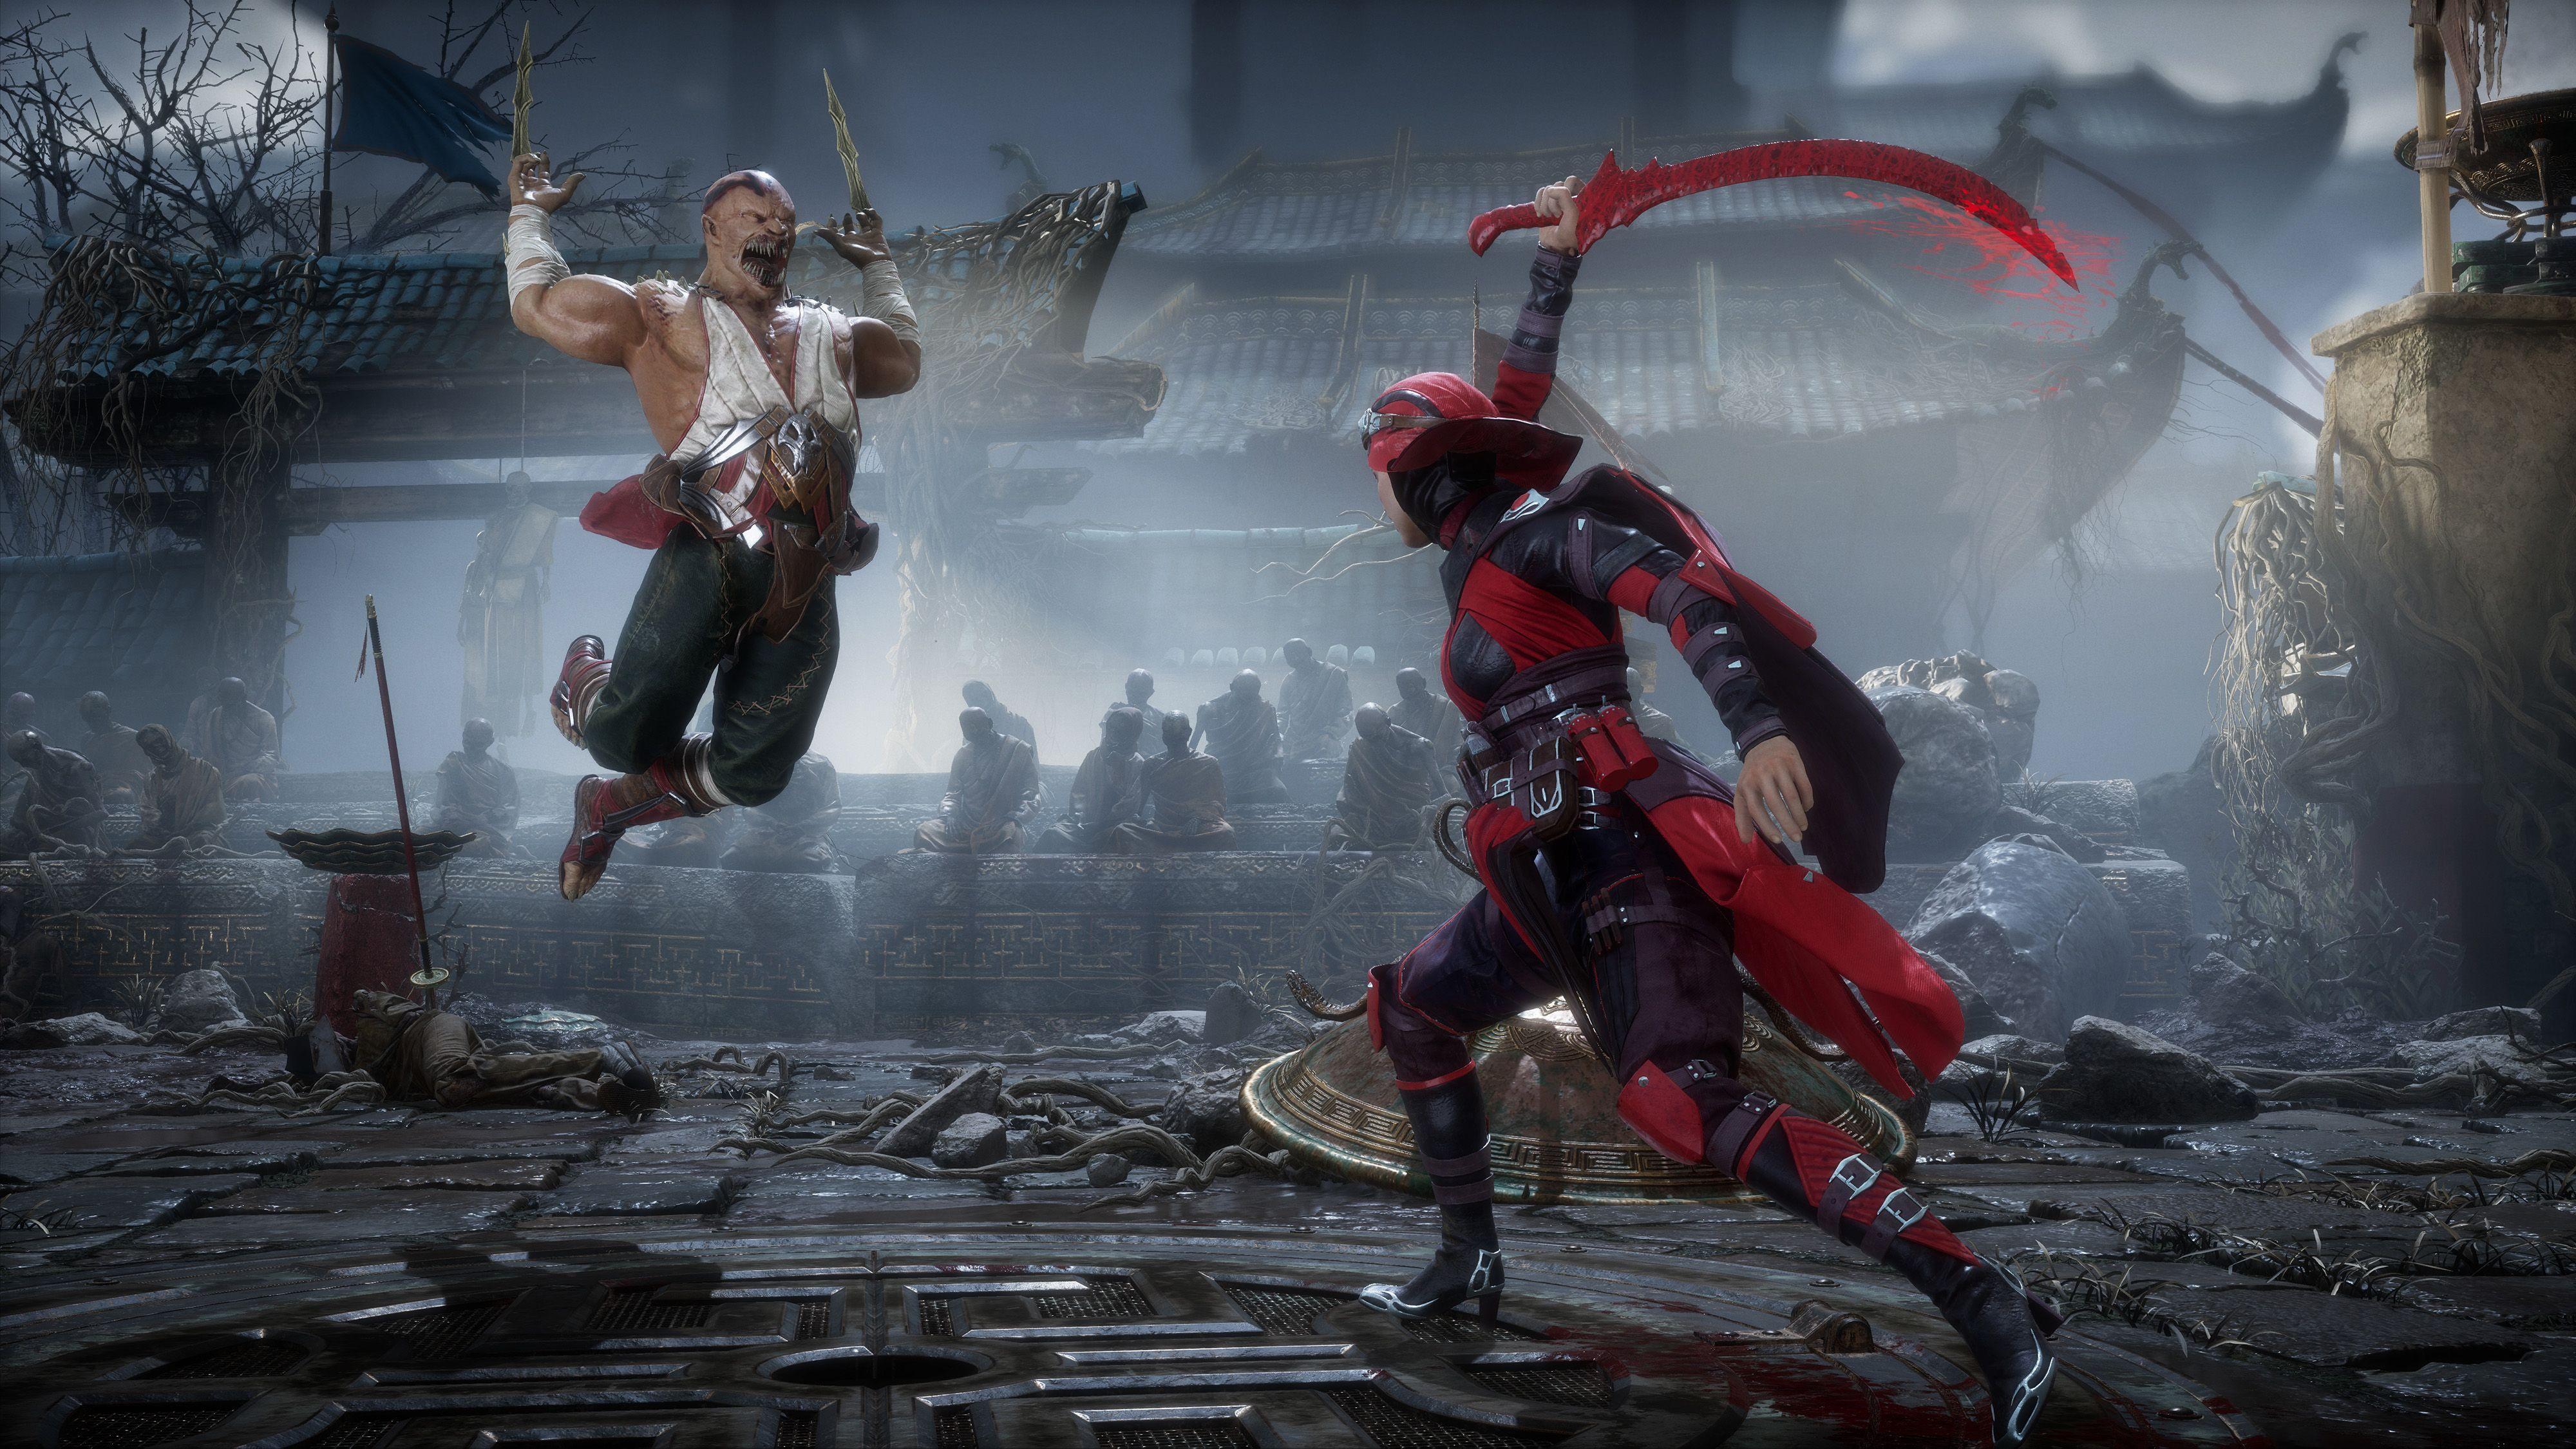 Mortal Kombat 11 Mortal Kombat Fighting Games Xbox One Games